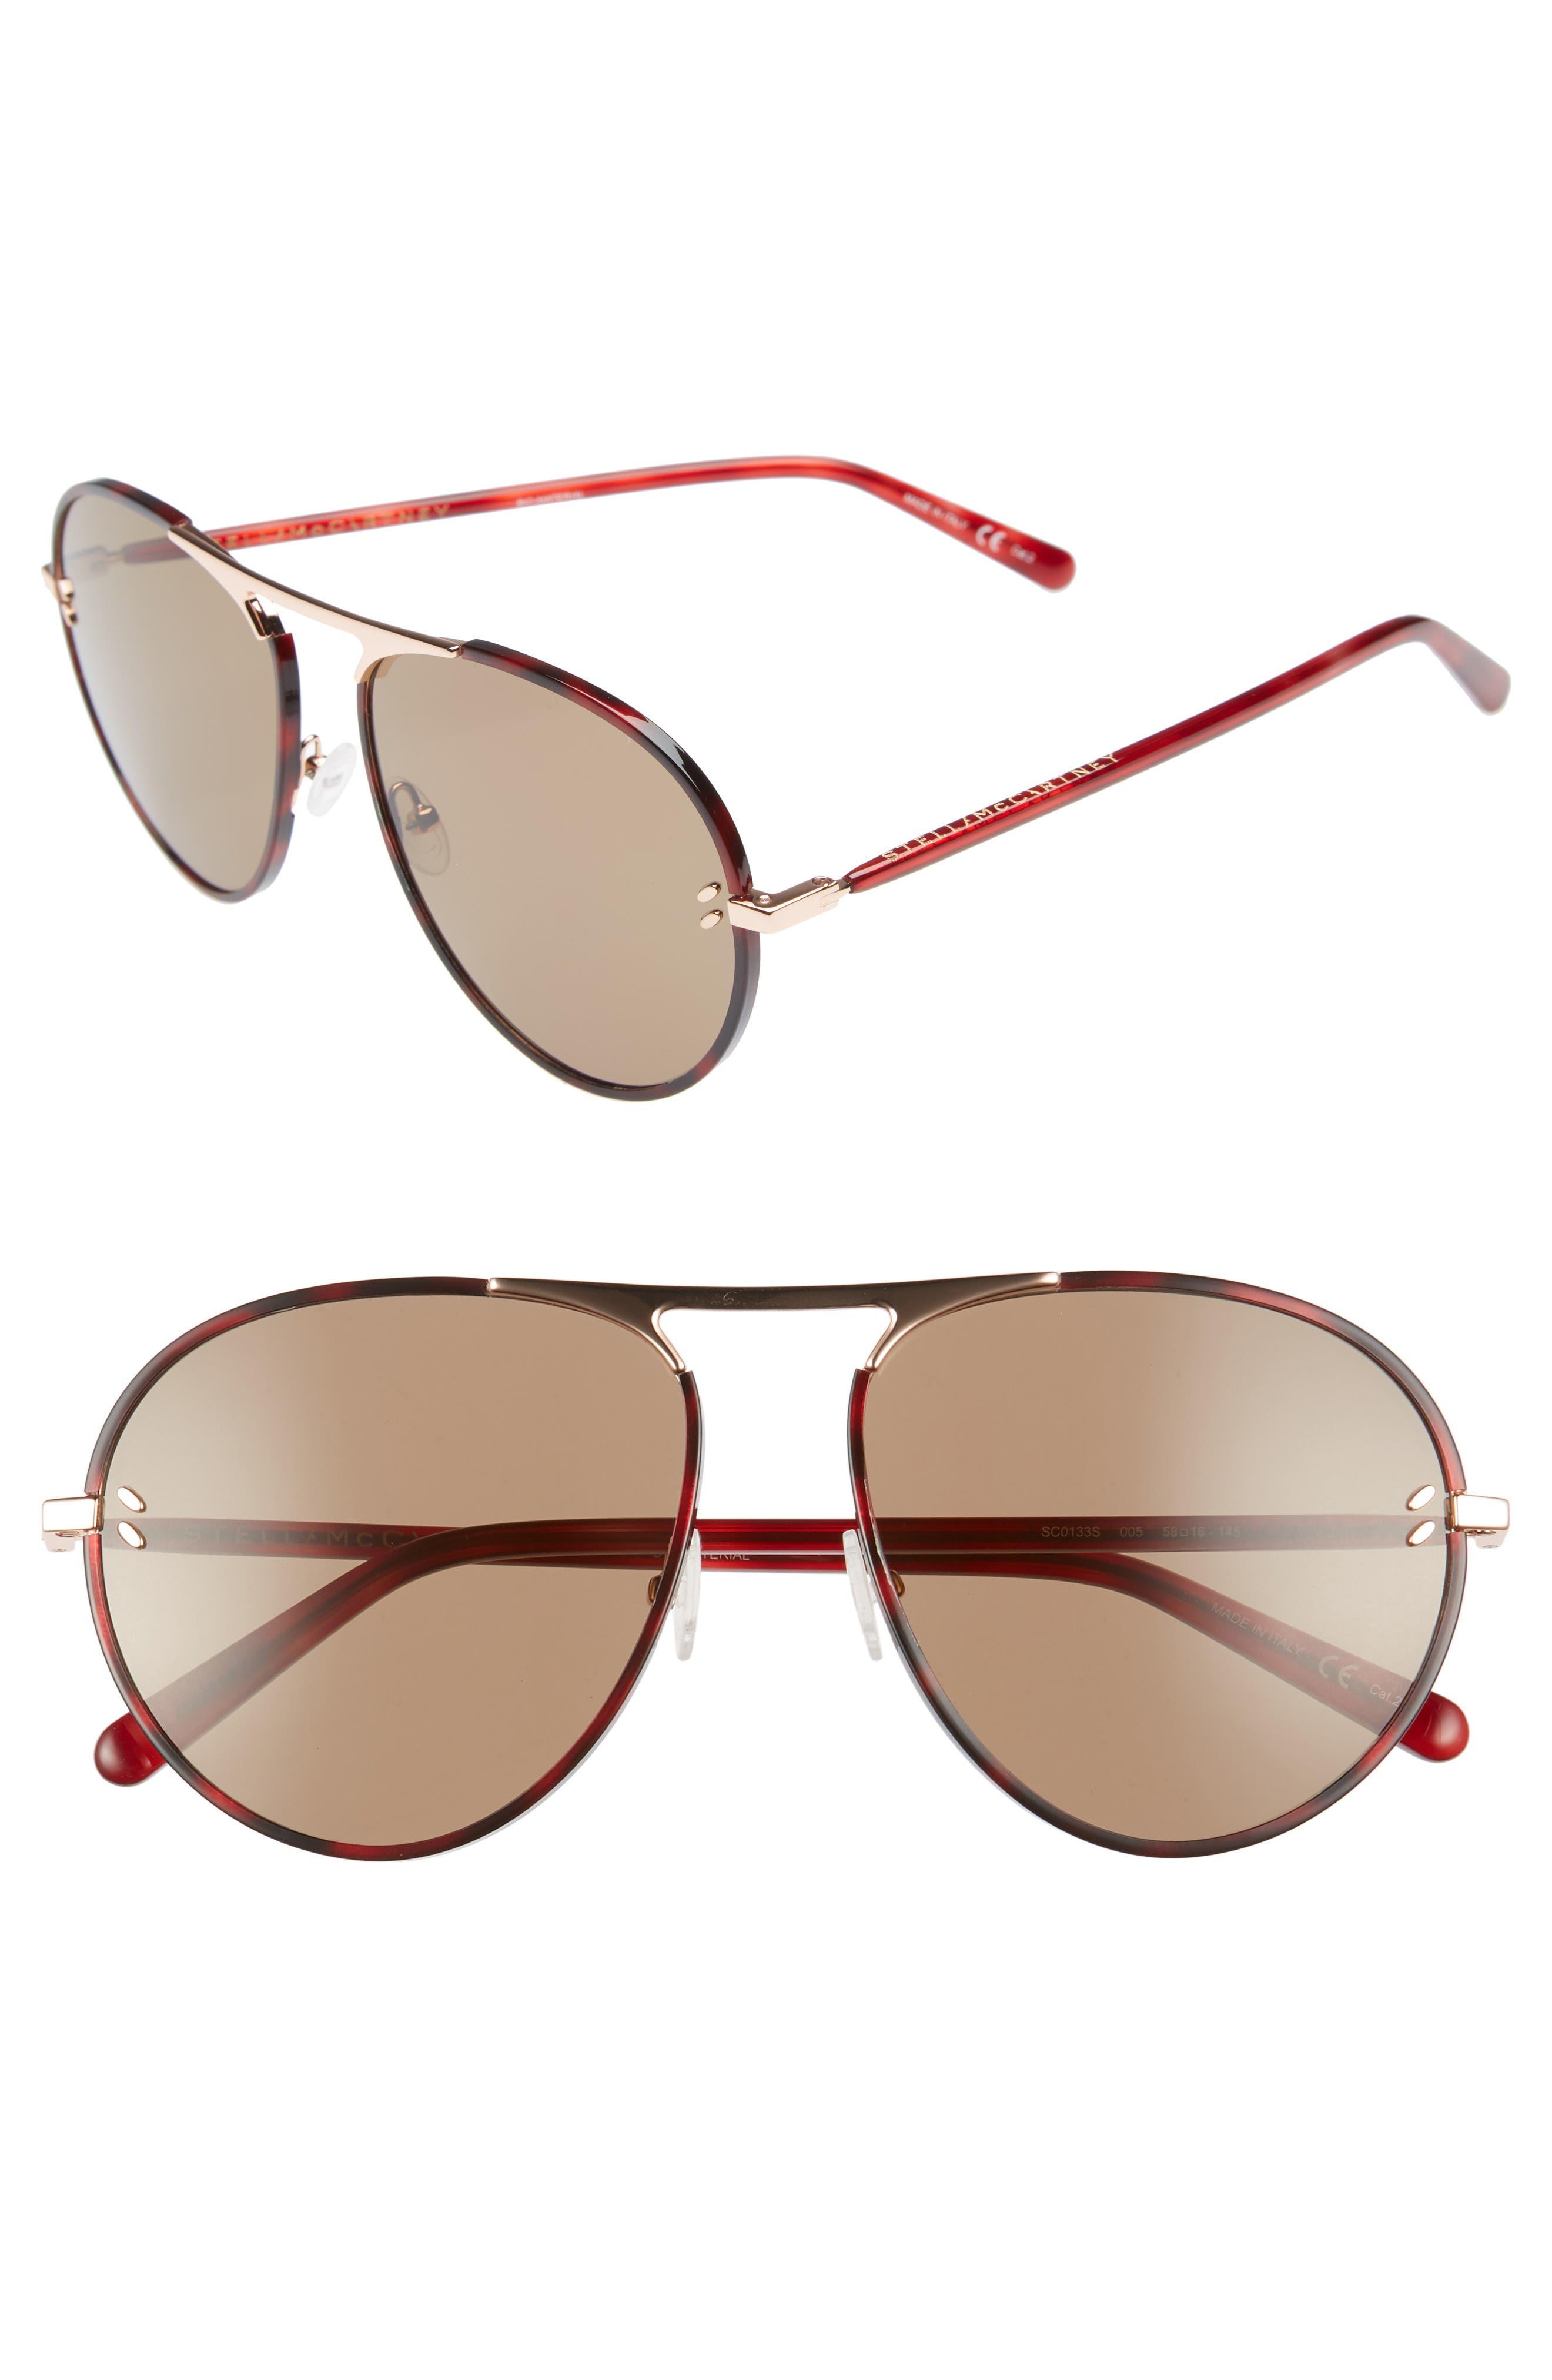 58mm Aviator Sunglasses,                         Main,                         color, Burgundy Havana